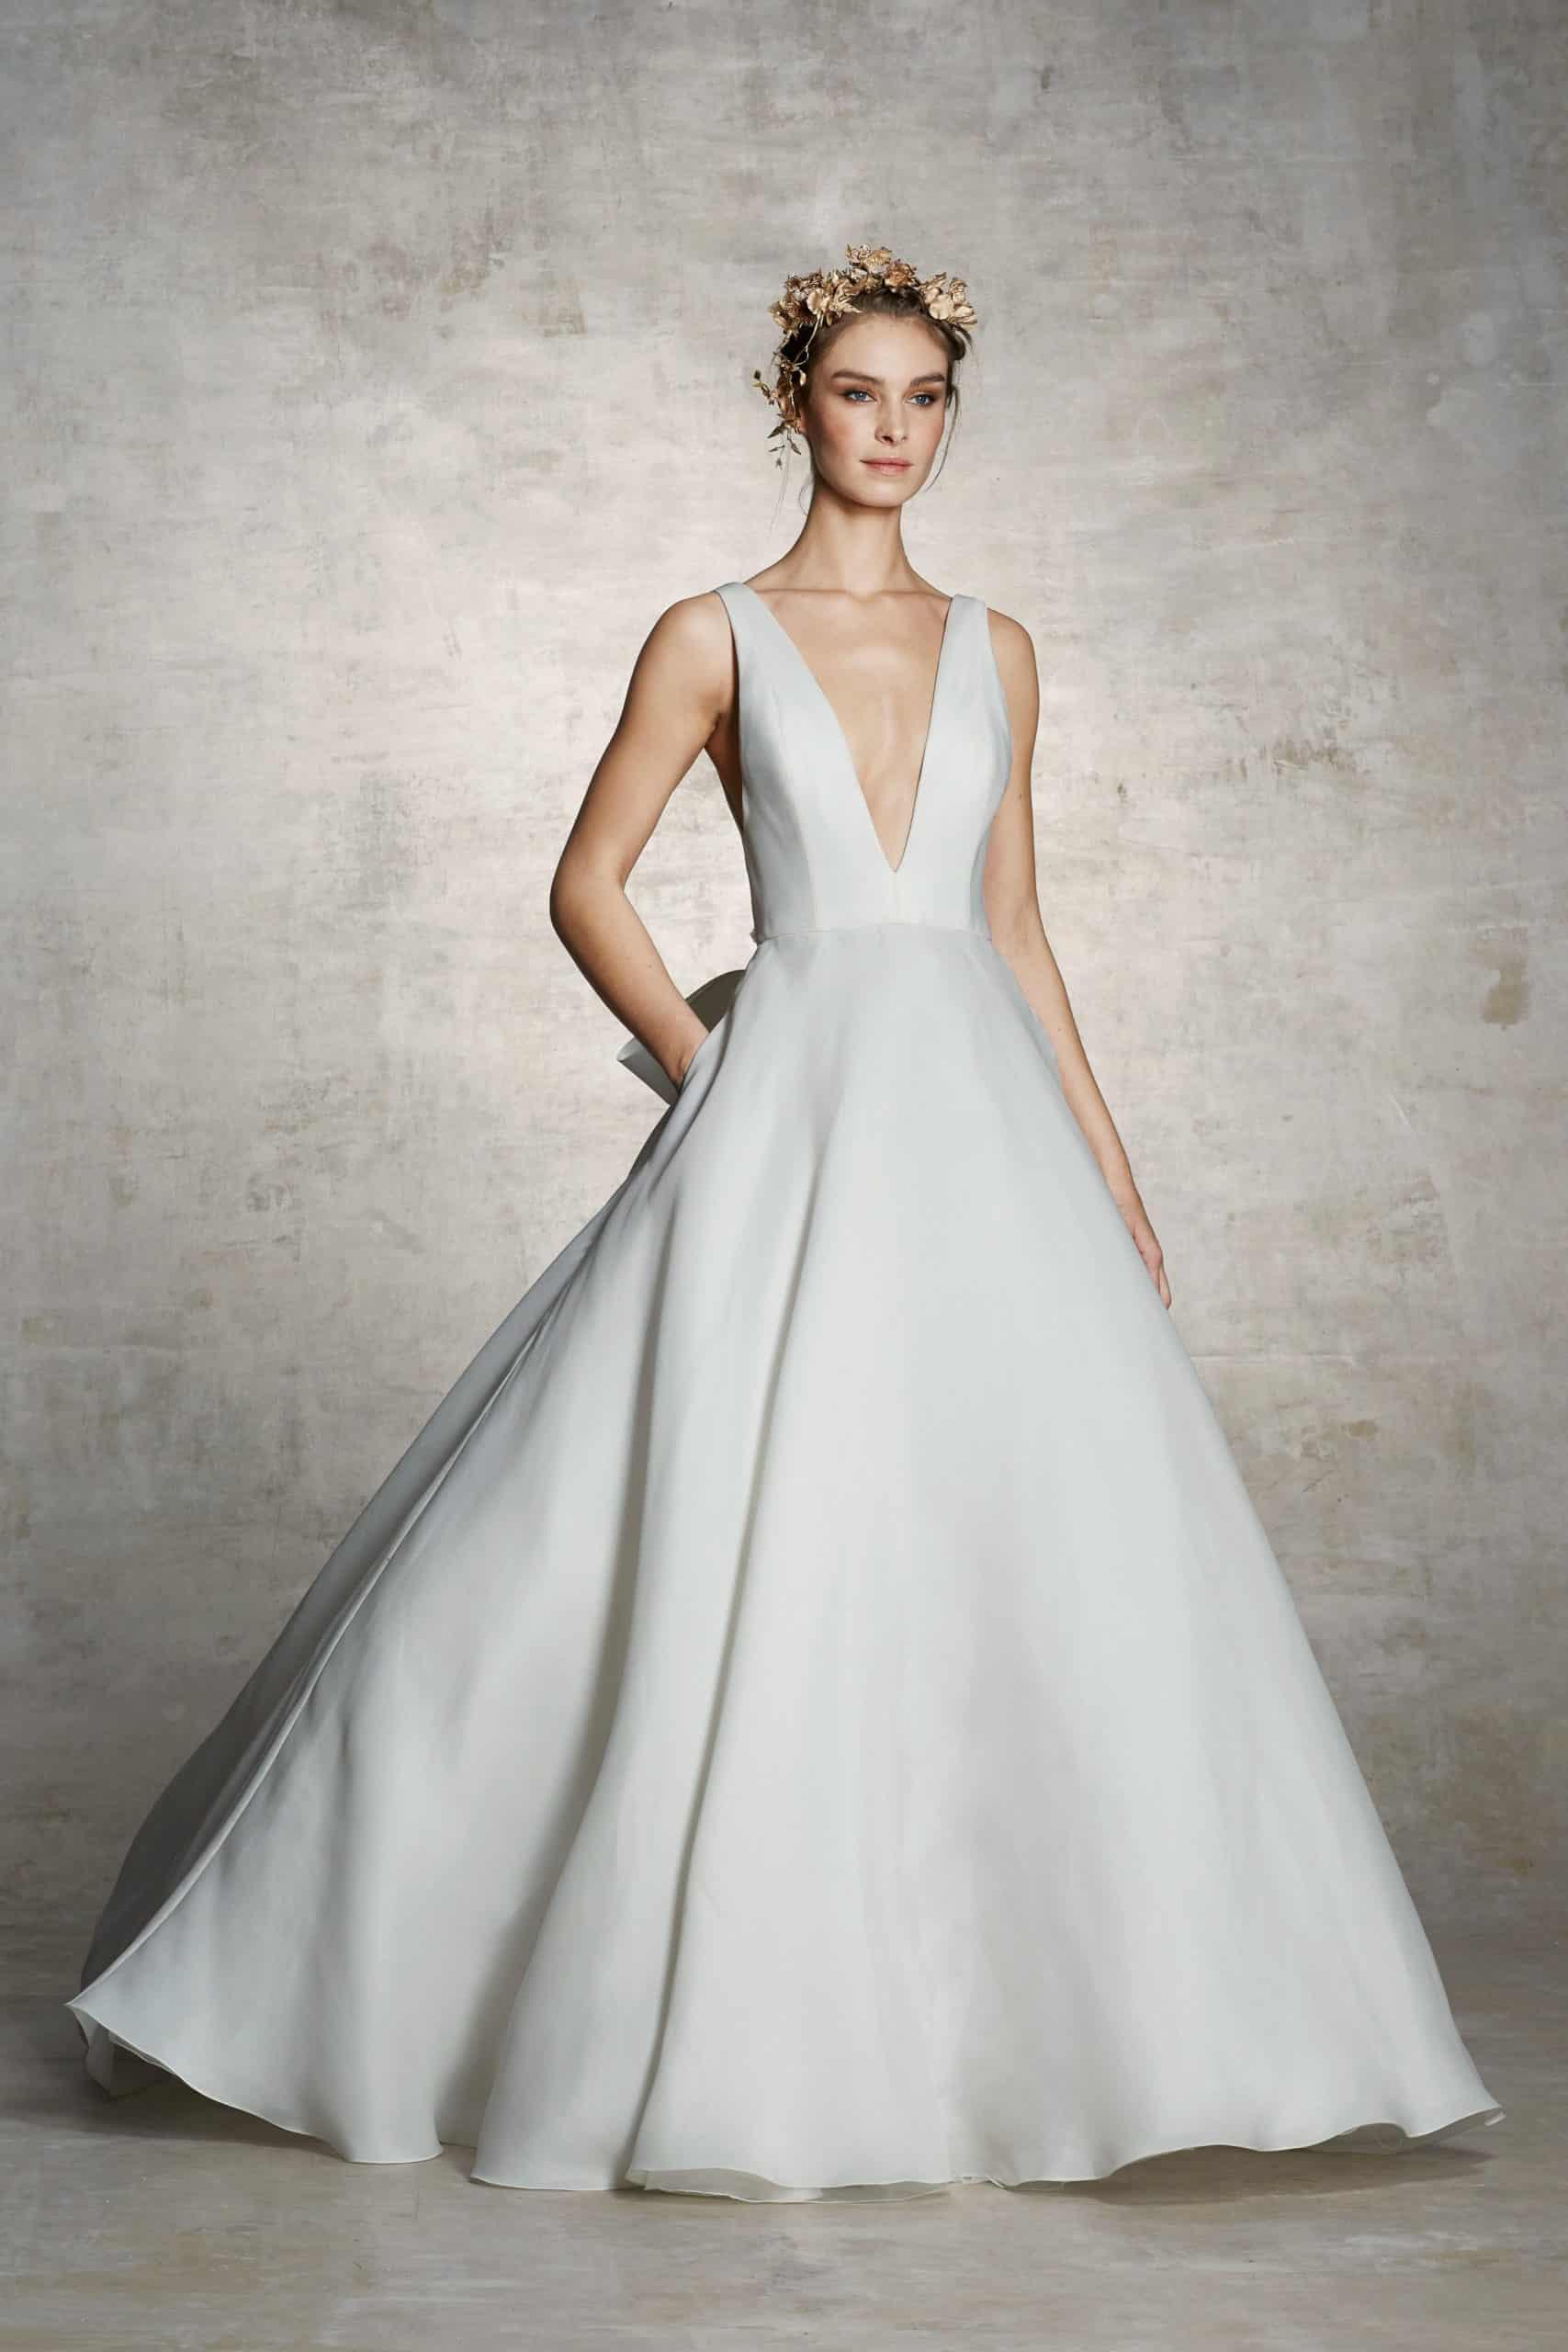 V-neck a line wedding dress by Marchesa